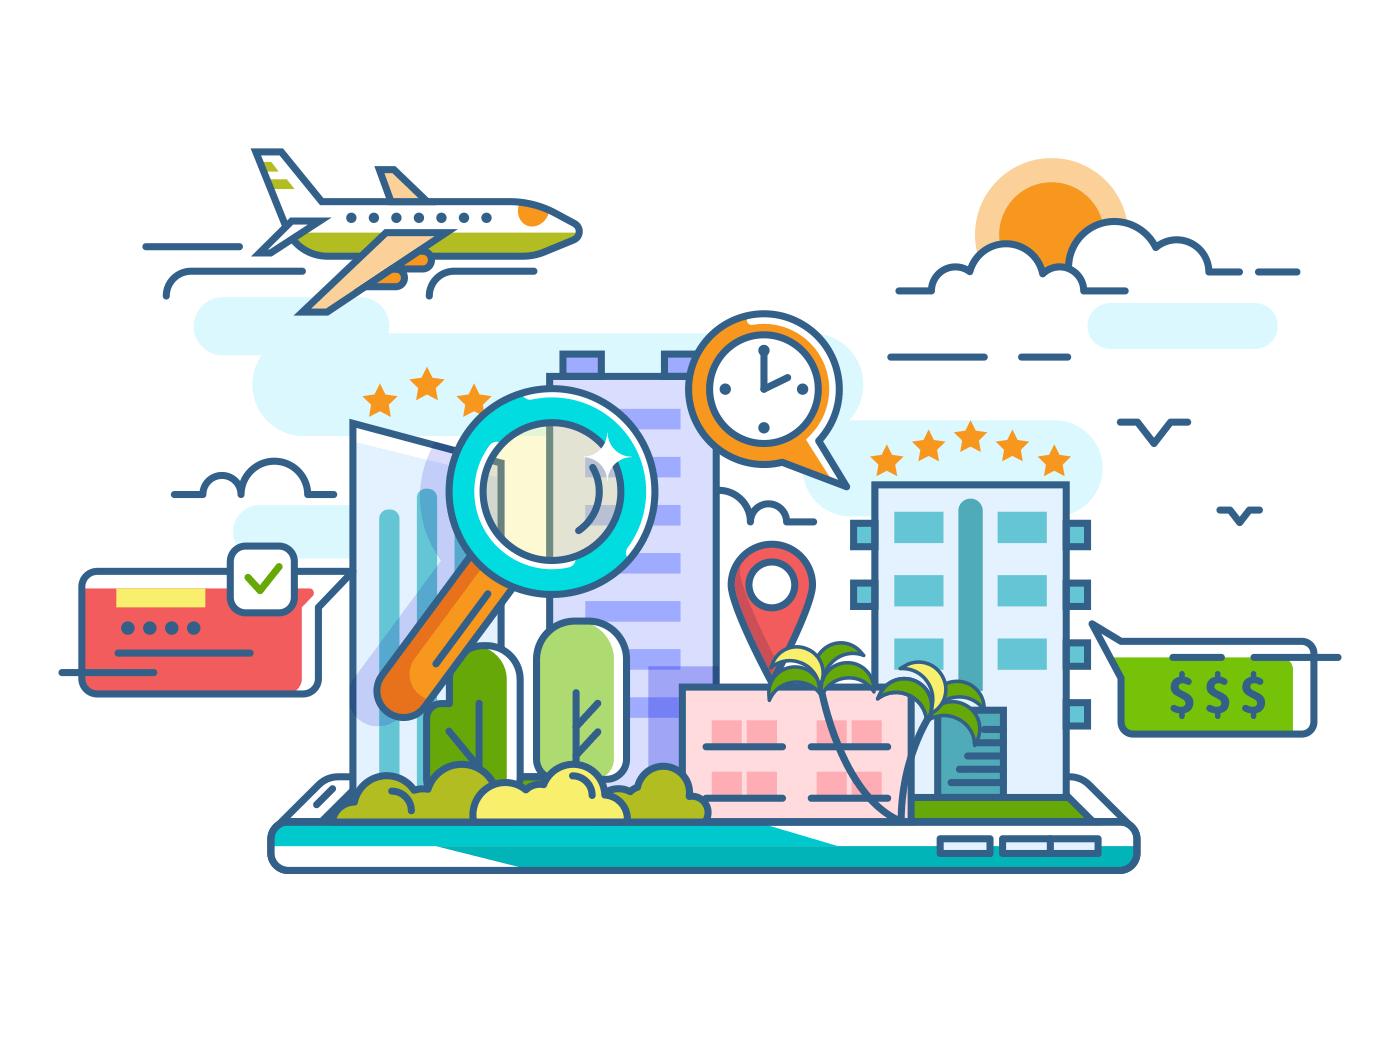 Booking reserve hotel illustration